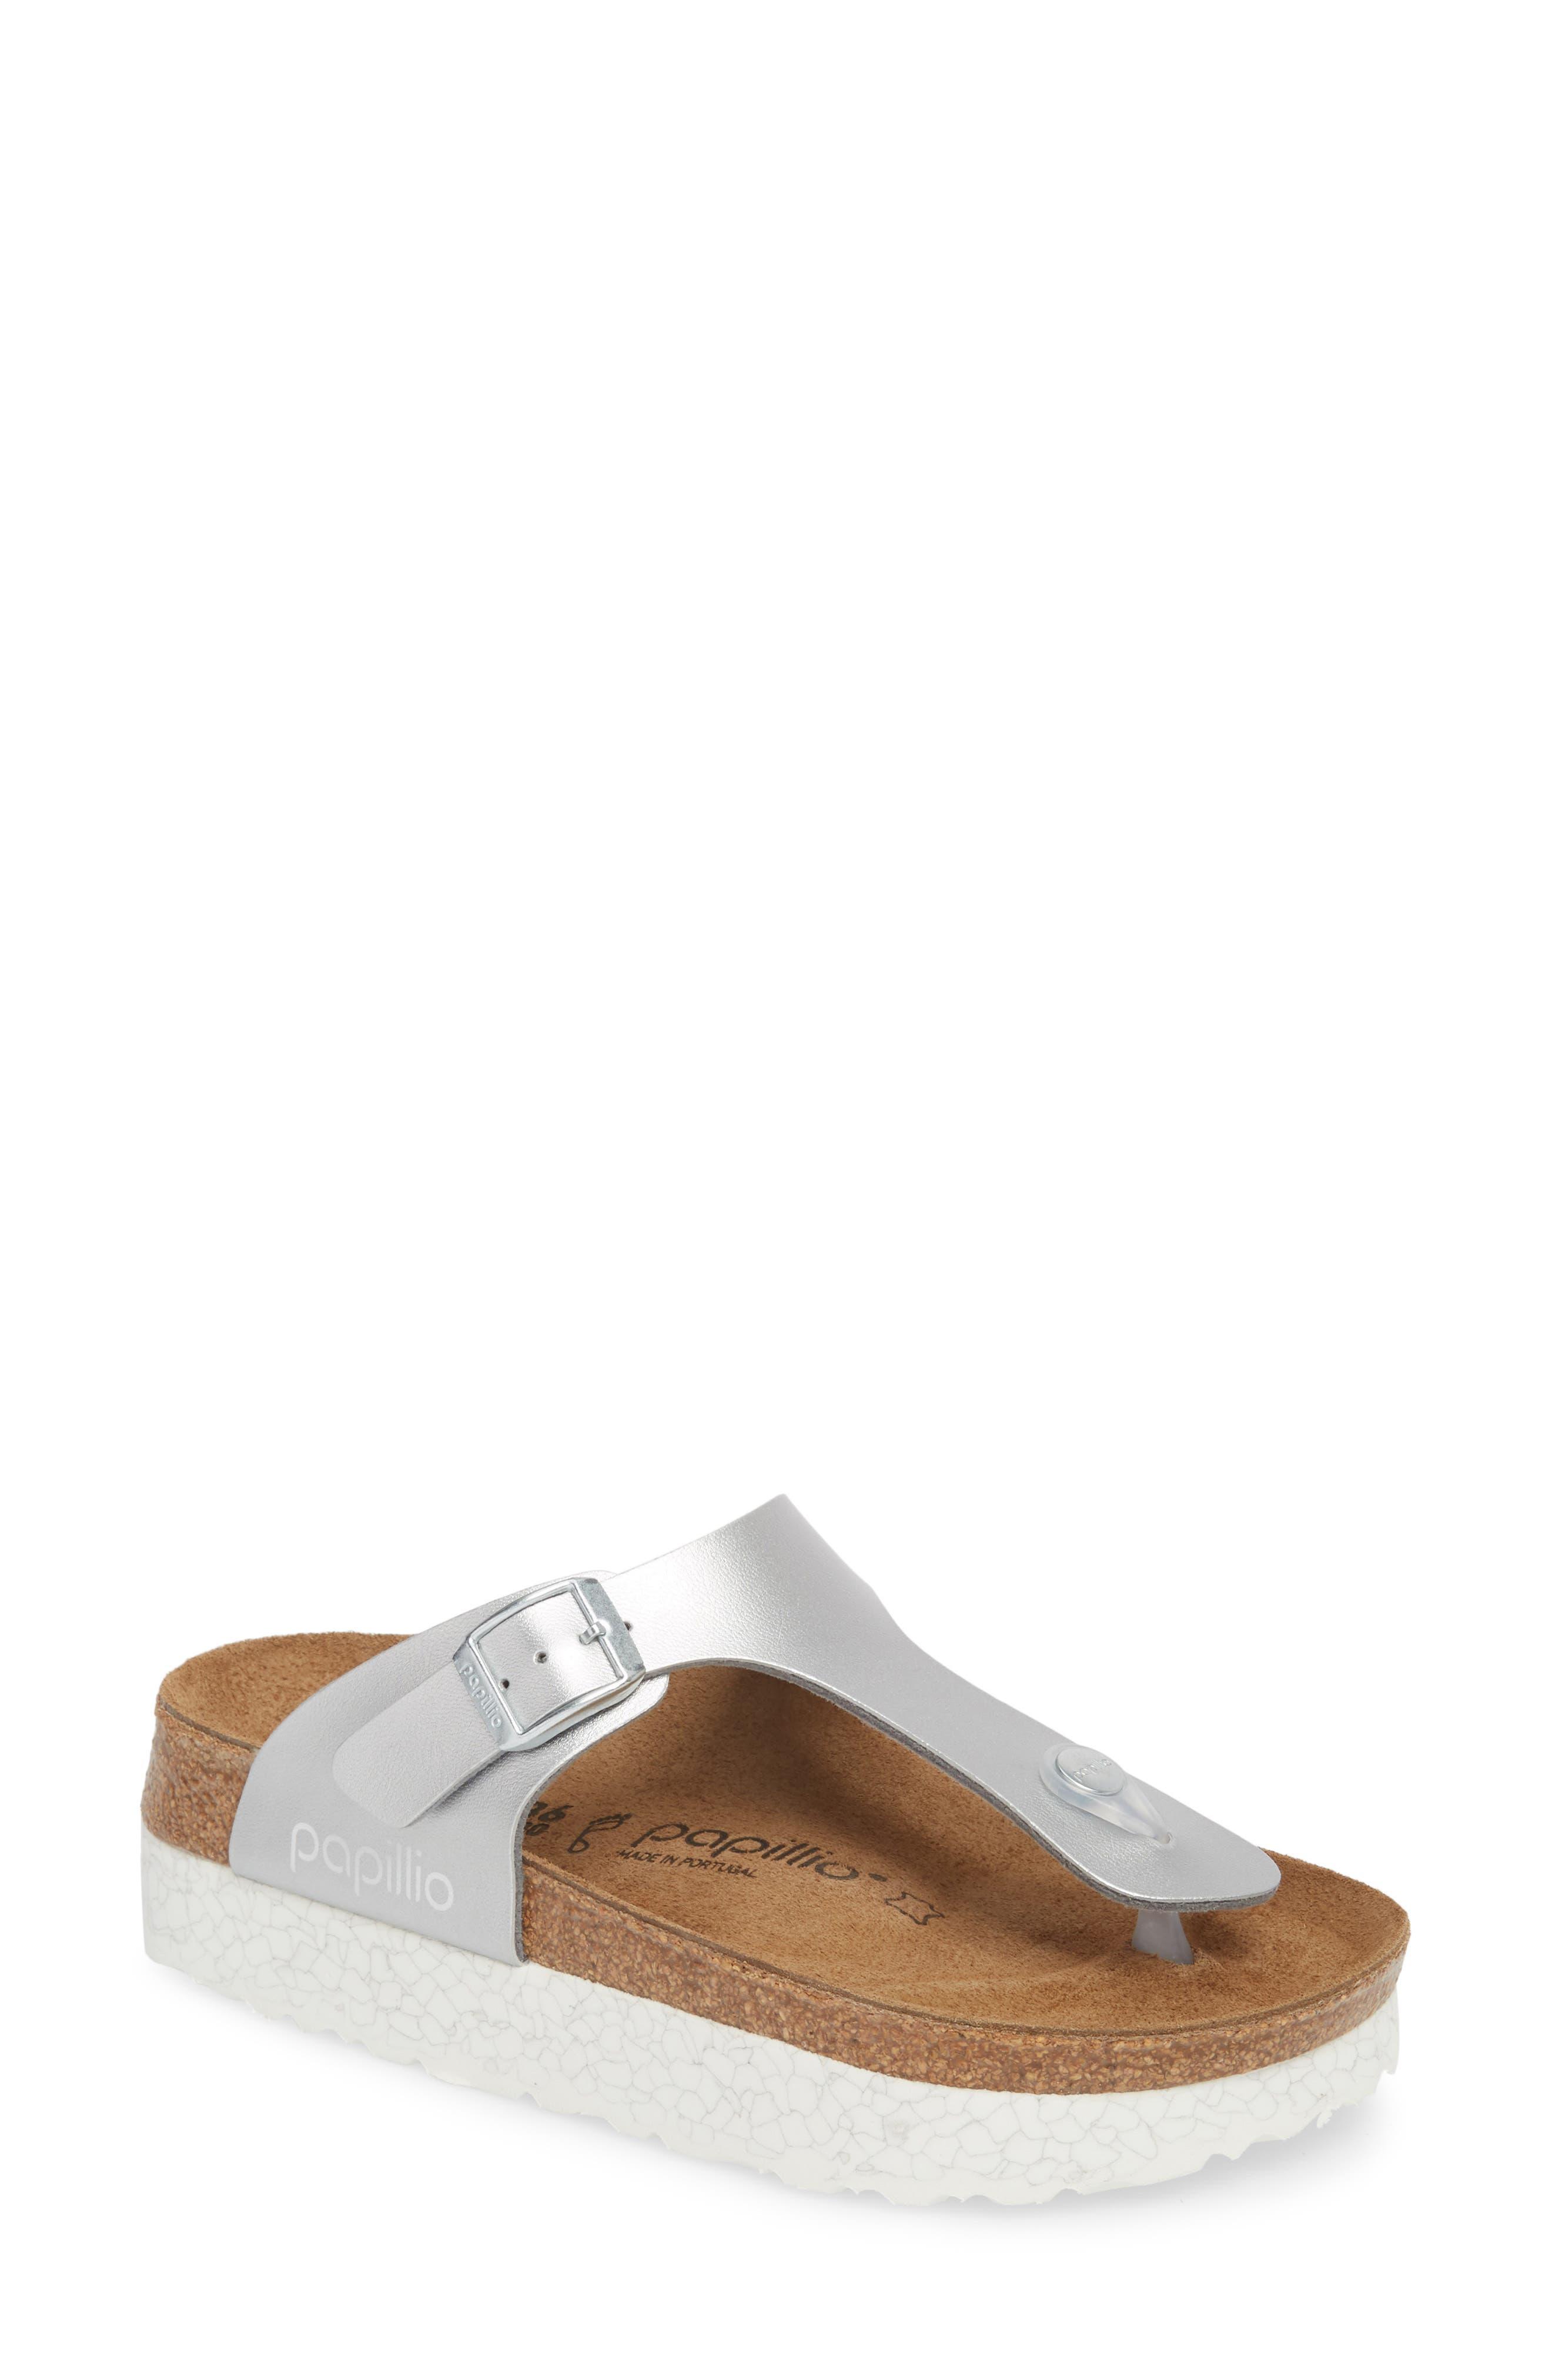 Papillio by Birkenstock 'Gizeh' Birko-Flor Platform Flip Flop Sandal,                         Main,                         color, Mono Marble Silver Leather